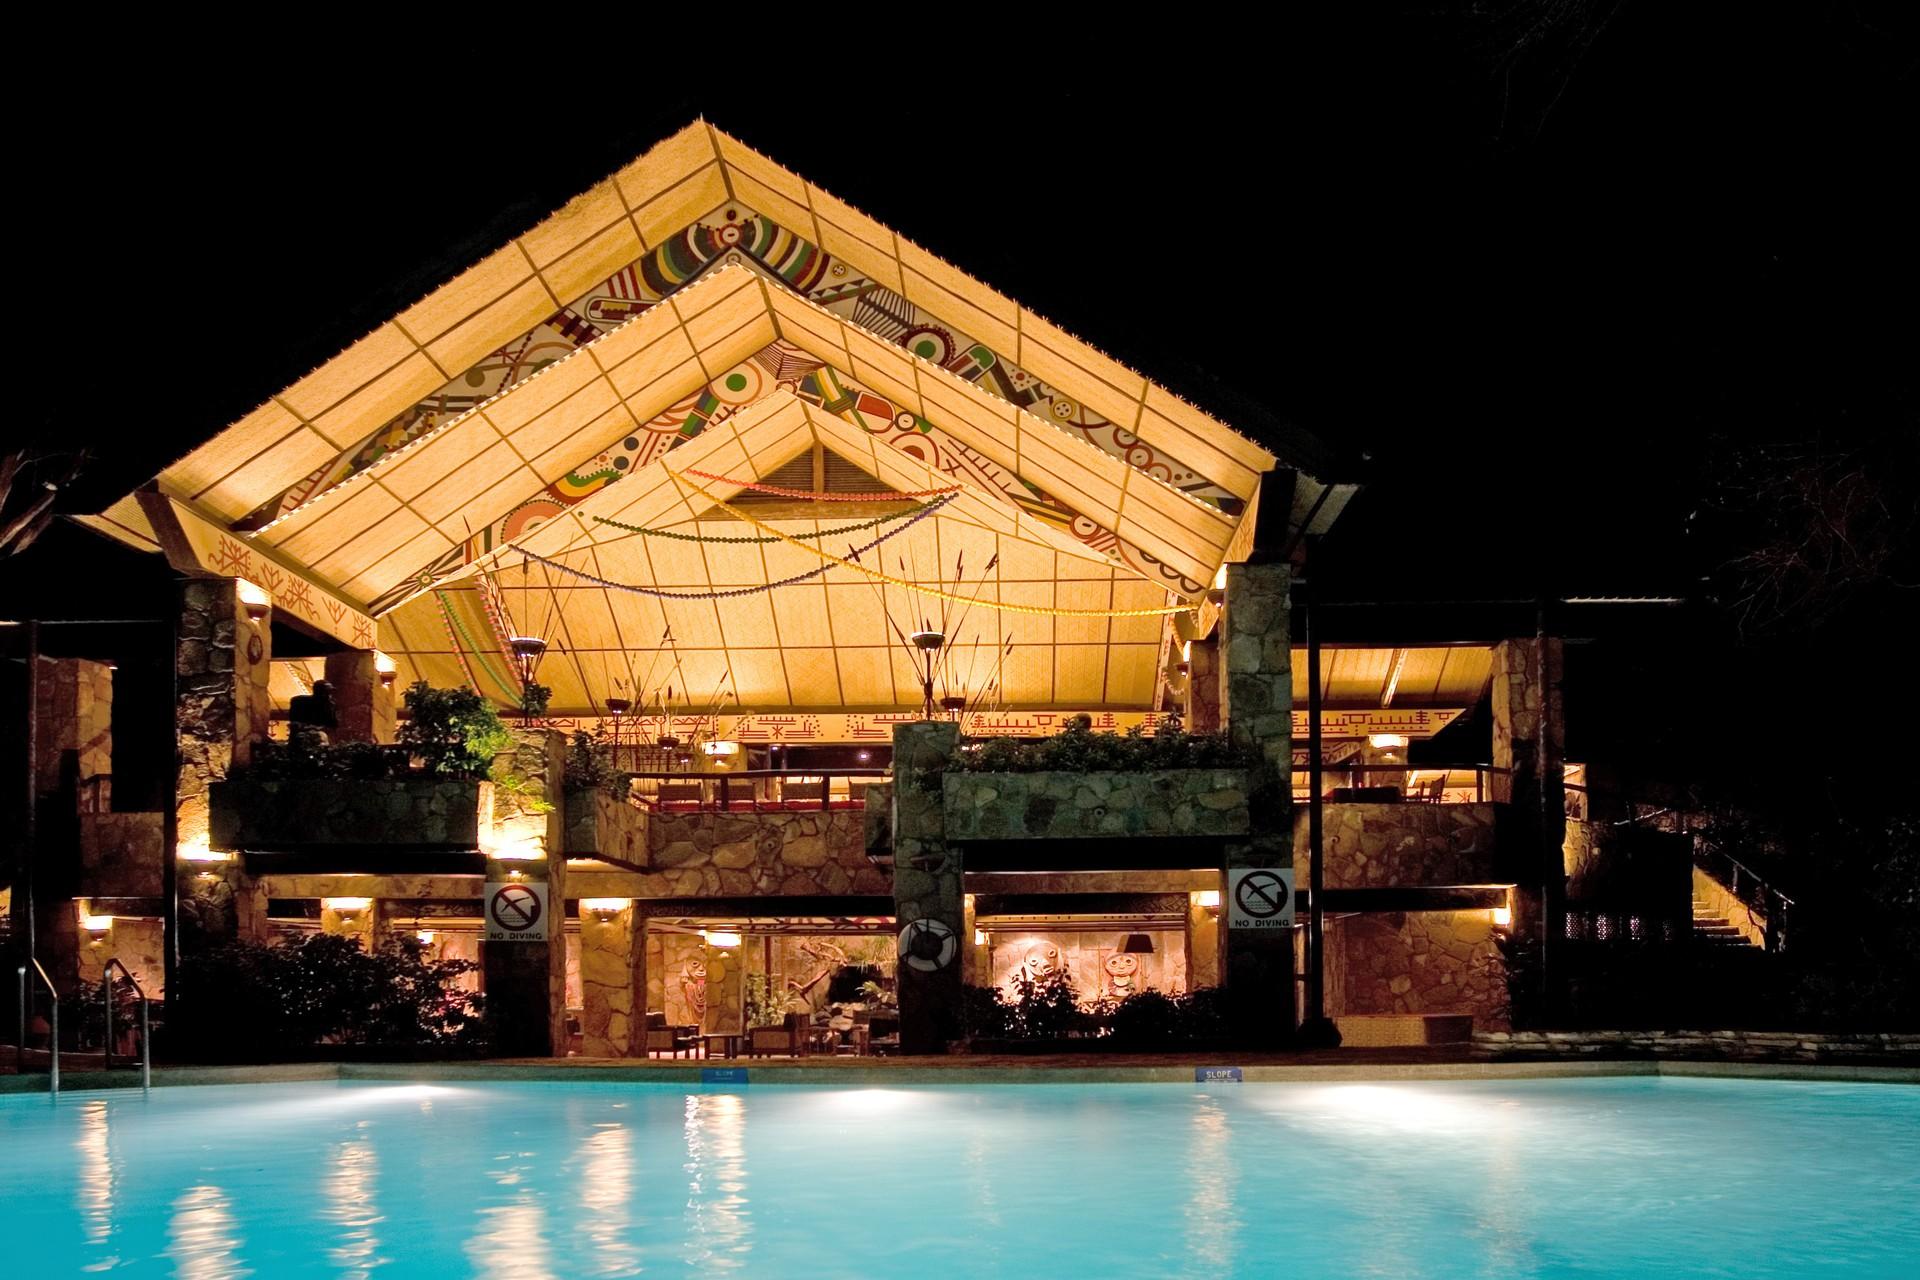 Night view of Kenyan safari lodge with pool